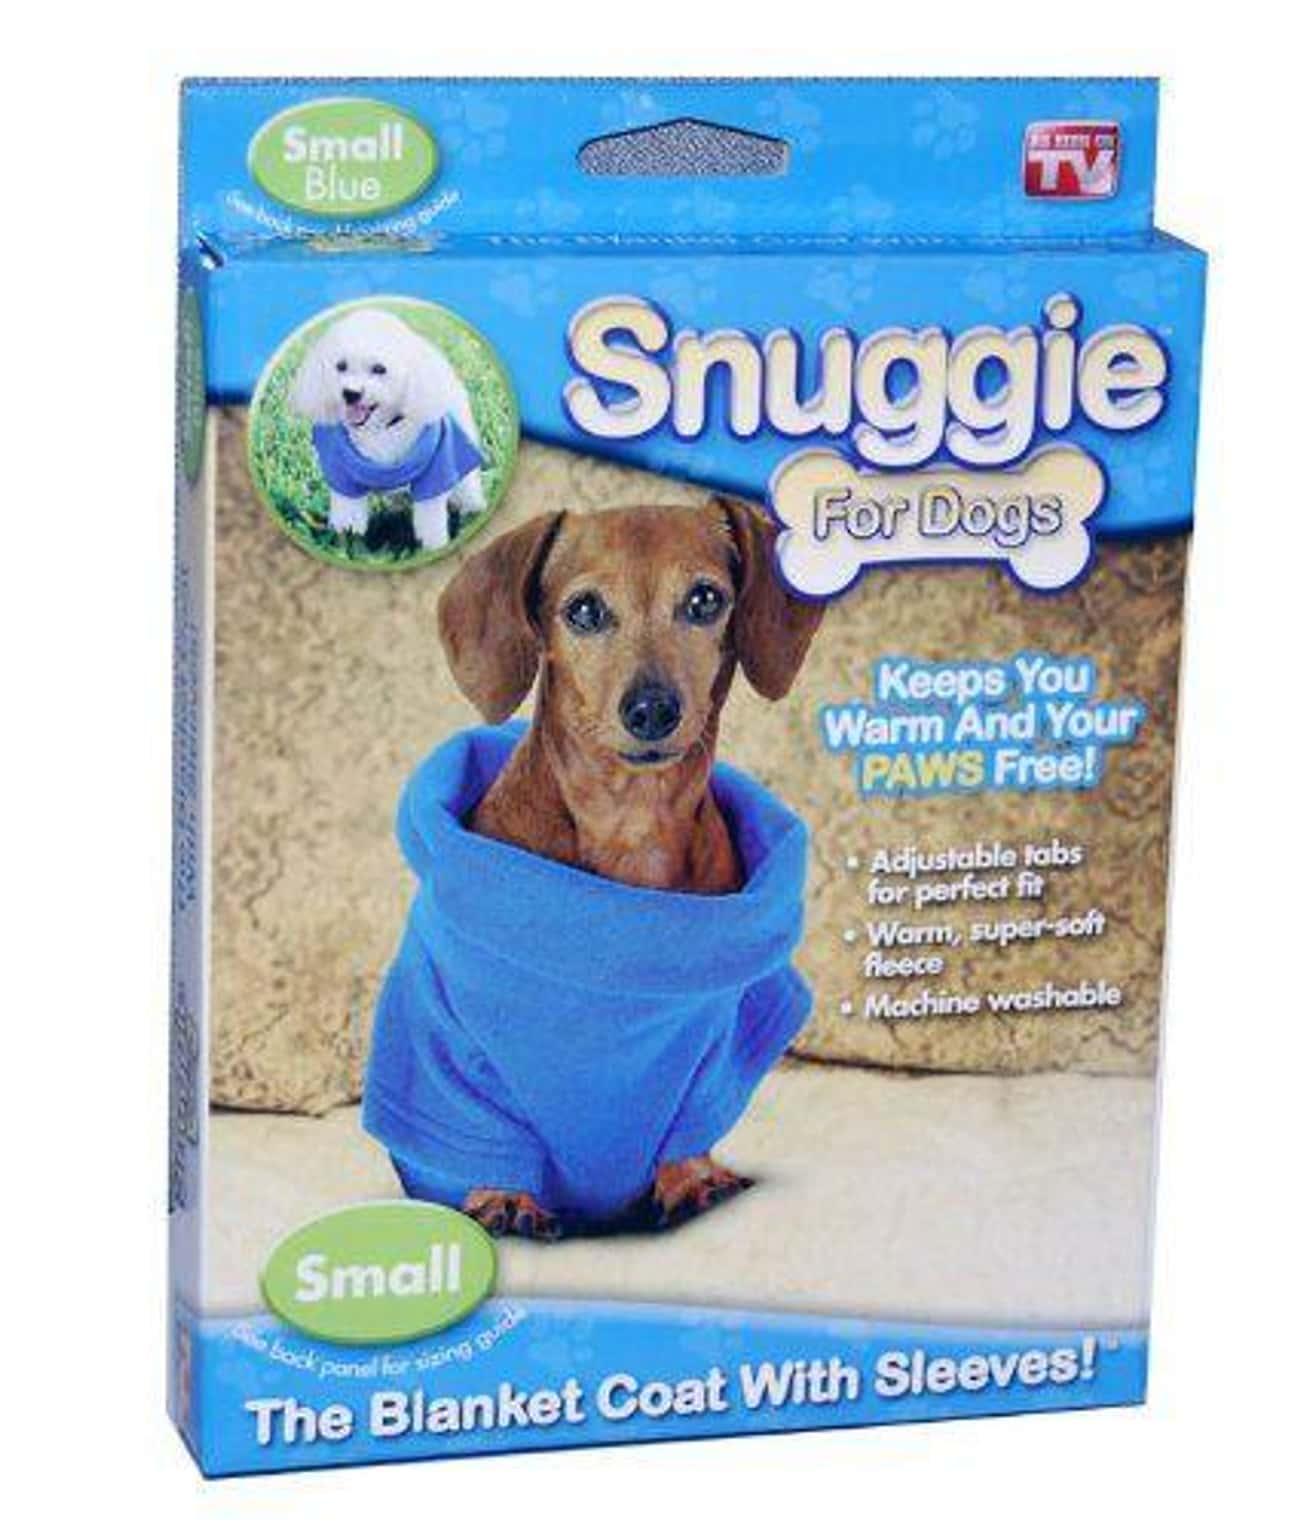 The Dog Snuggie